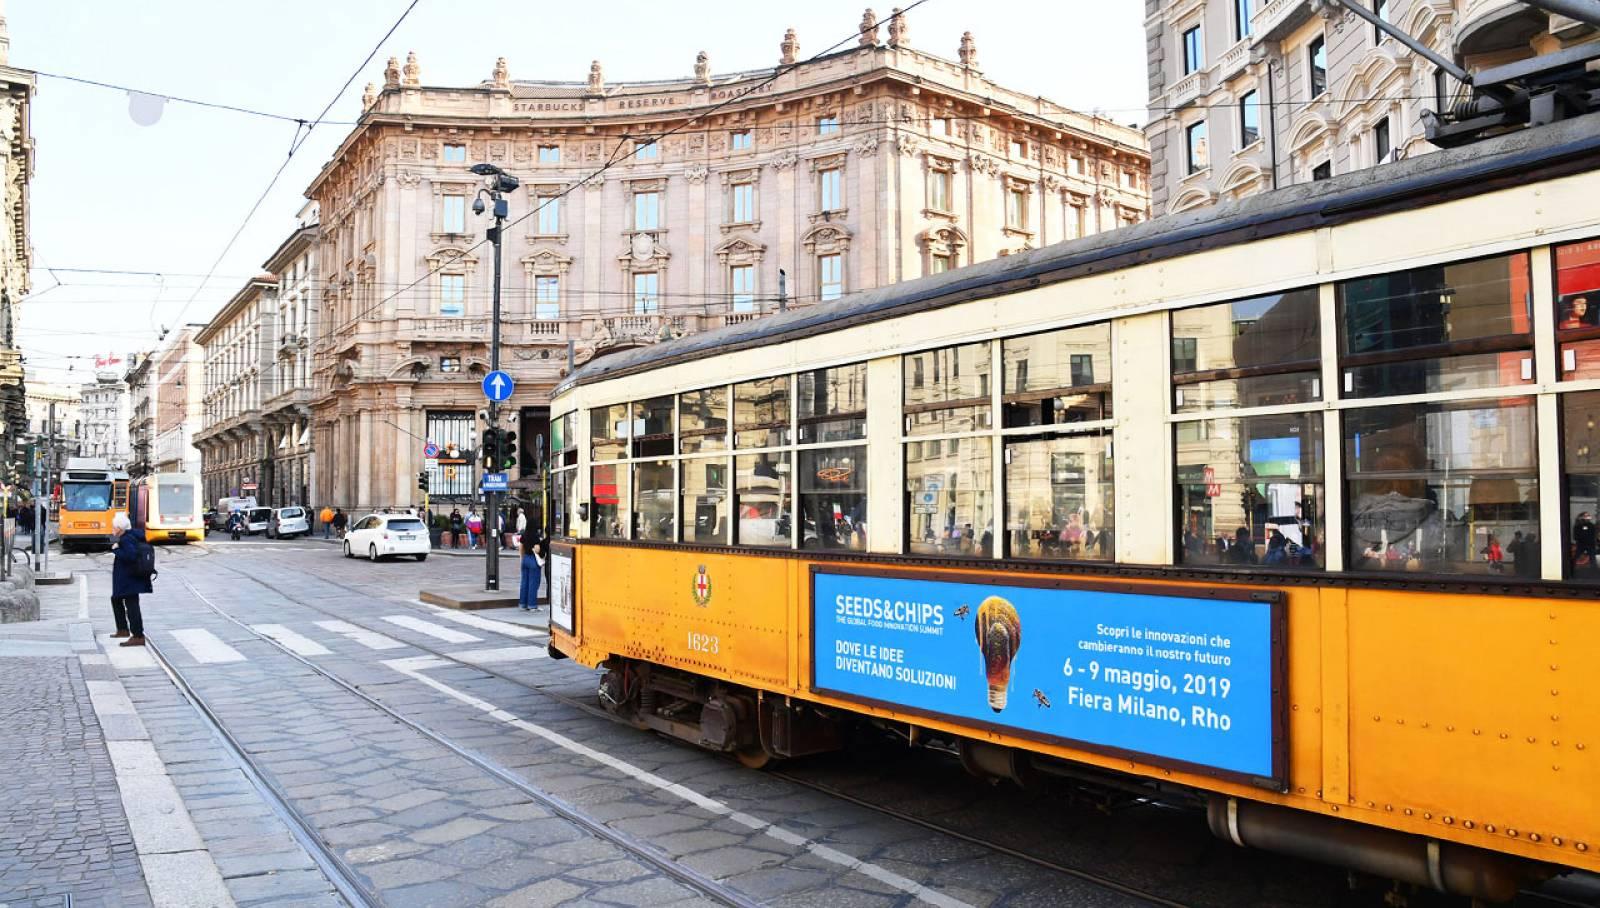 Pubblicità su tram a Milano IGPDecaux side Banner per Seeds&Chips